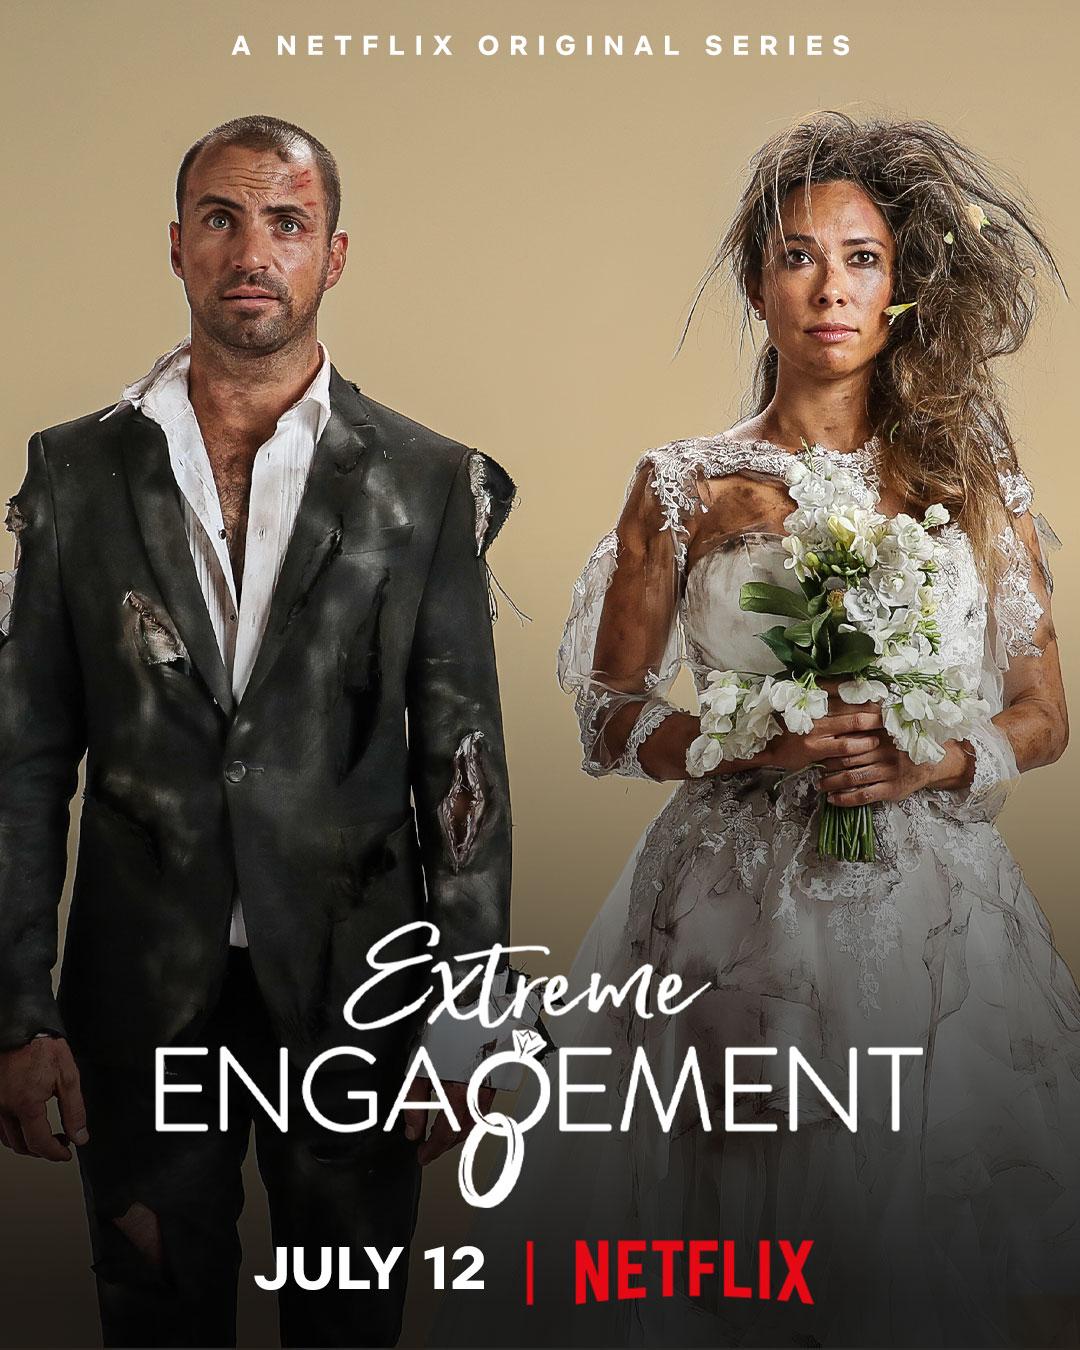 Ekstremalūs įsipareigojimai (1 Sezonas) / Extreme Engagement Season 1